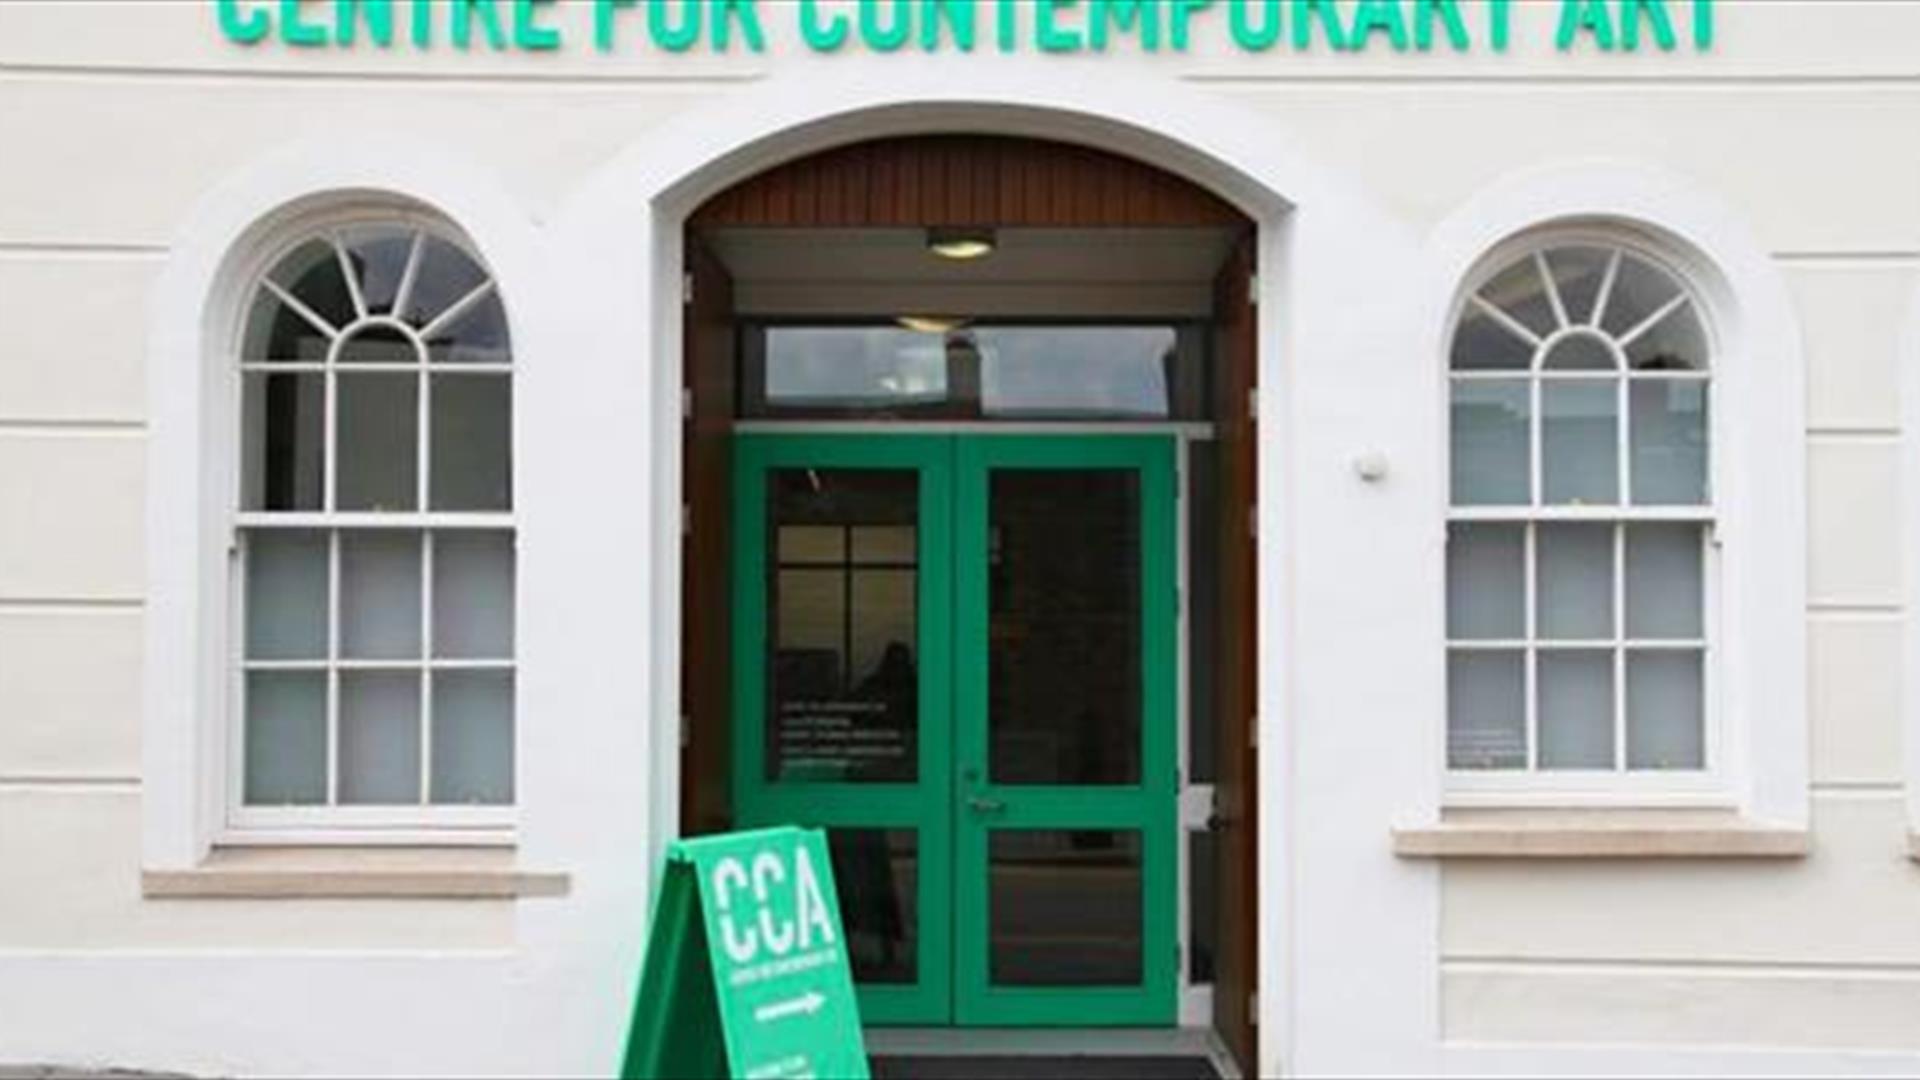 The Centre for Contemporary Arts